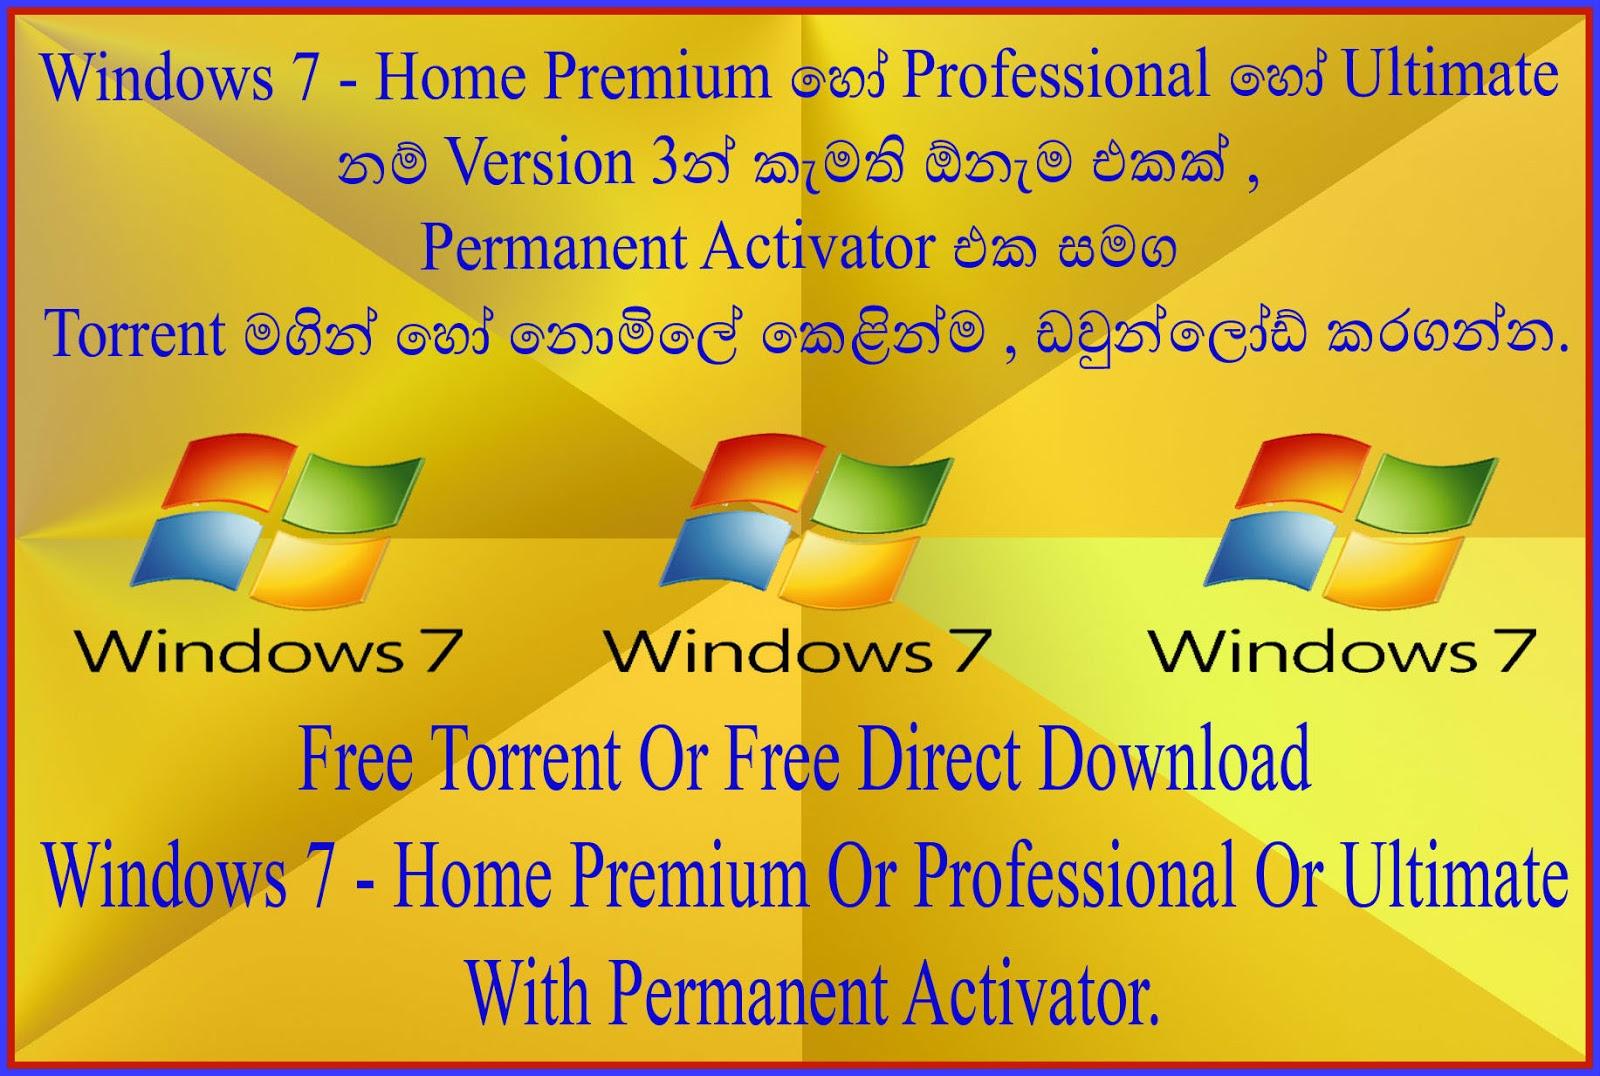 torrent download problems windows 7 home premium 64 bit free download